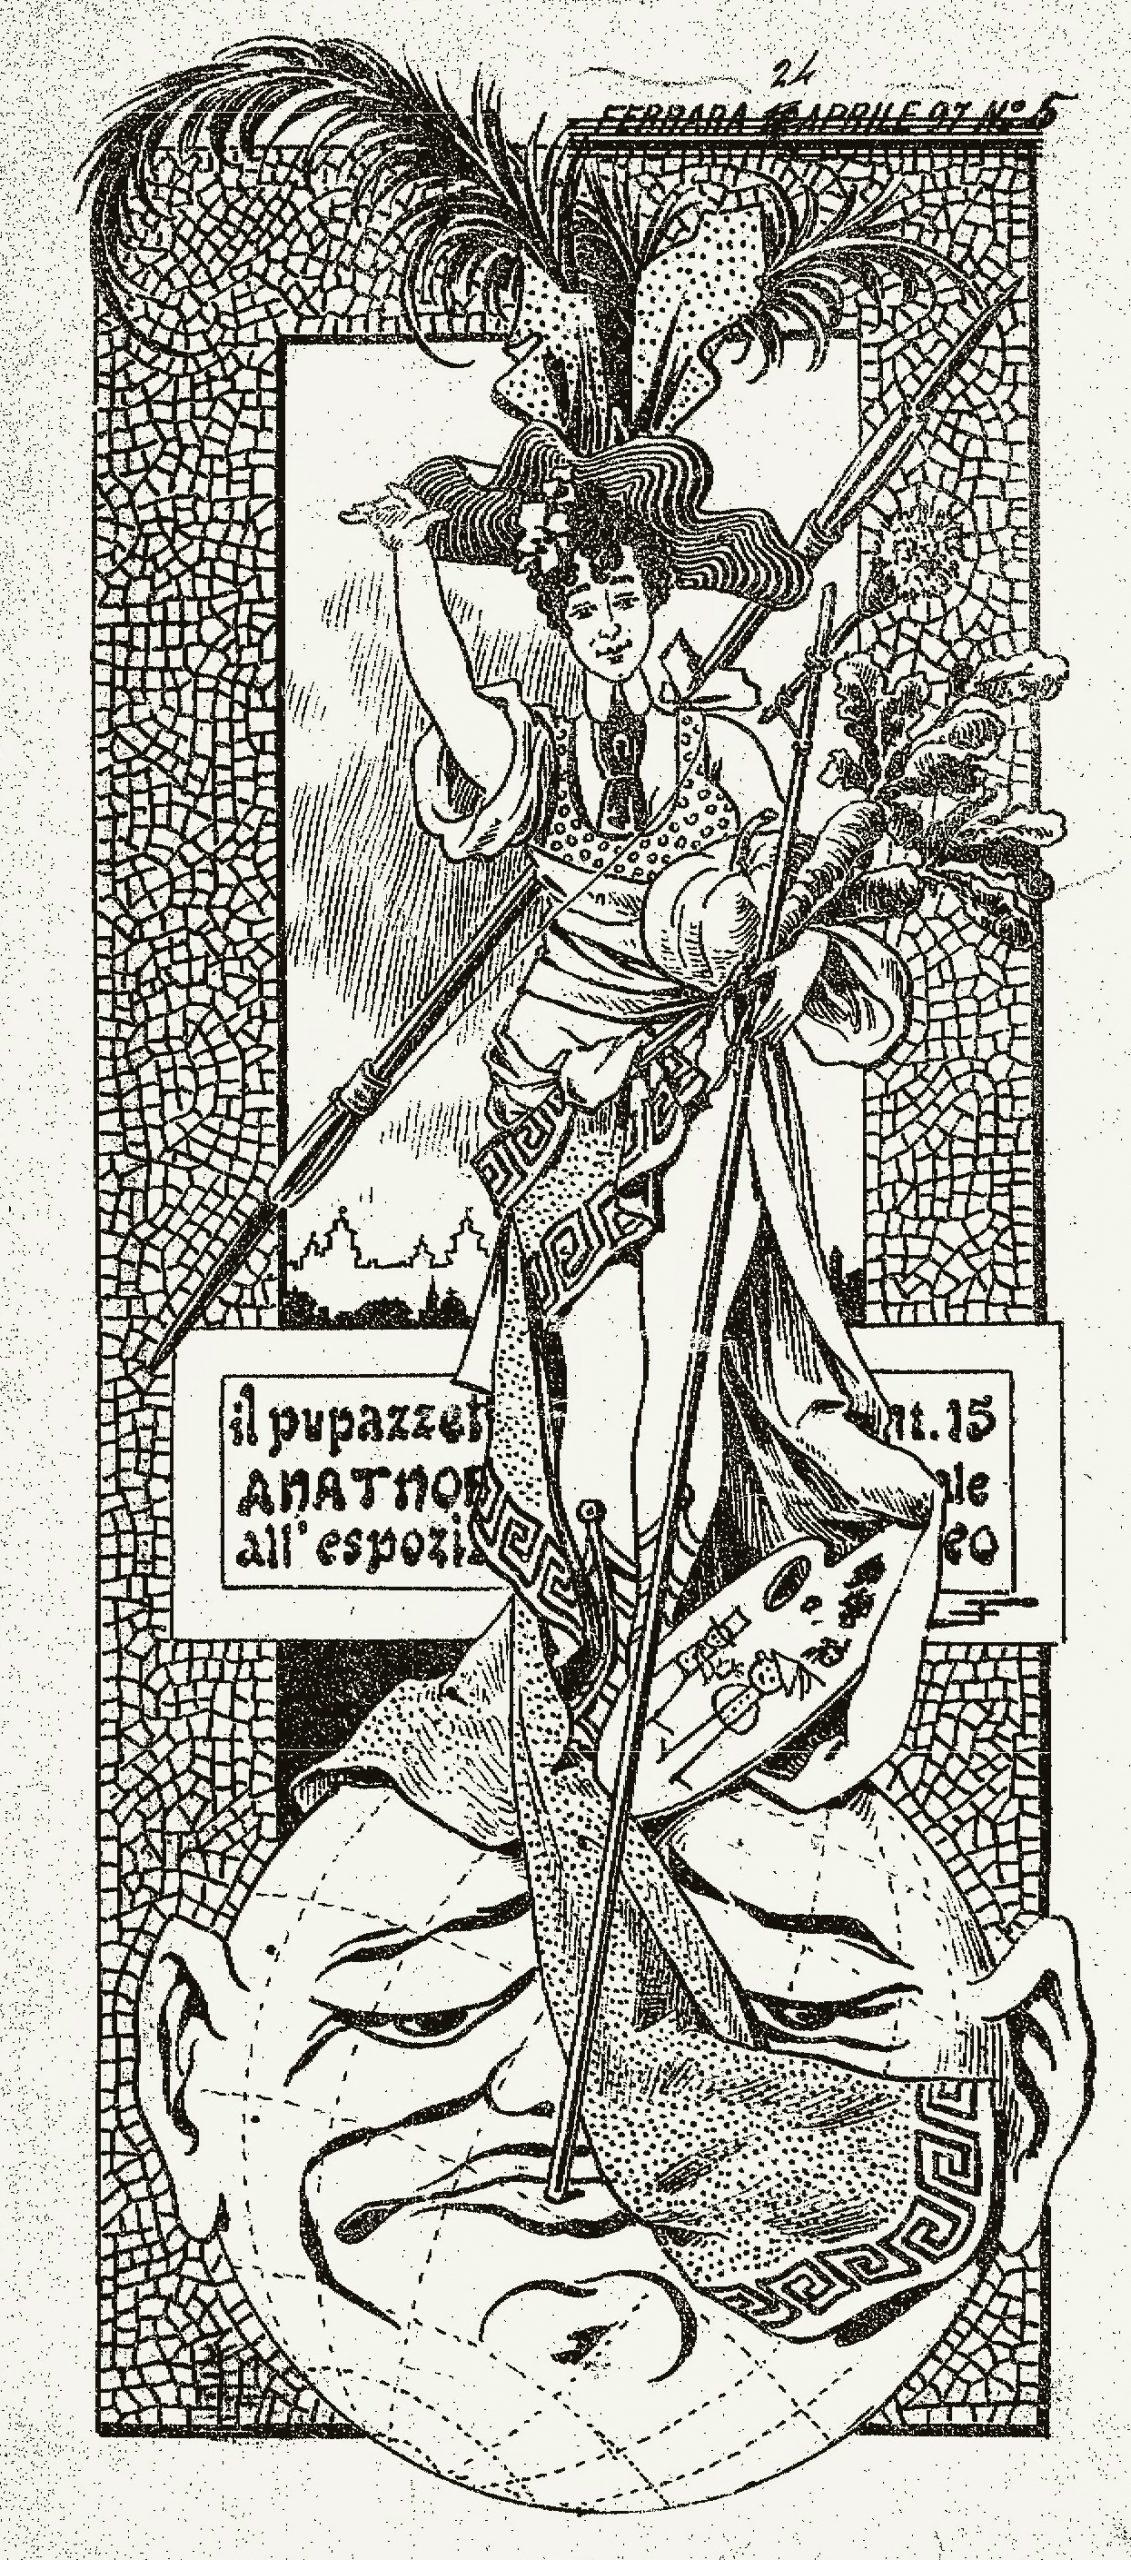 "Fig. 12 - E. Fontana (Anatnof), ""Il Pupazzetto Anatnof»"", 5, 18 aprile 1897, p. 1"